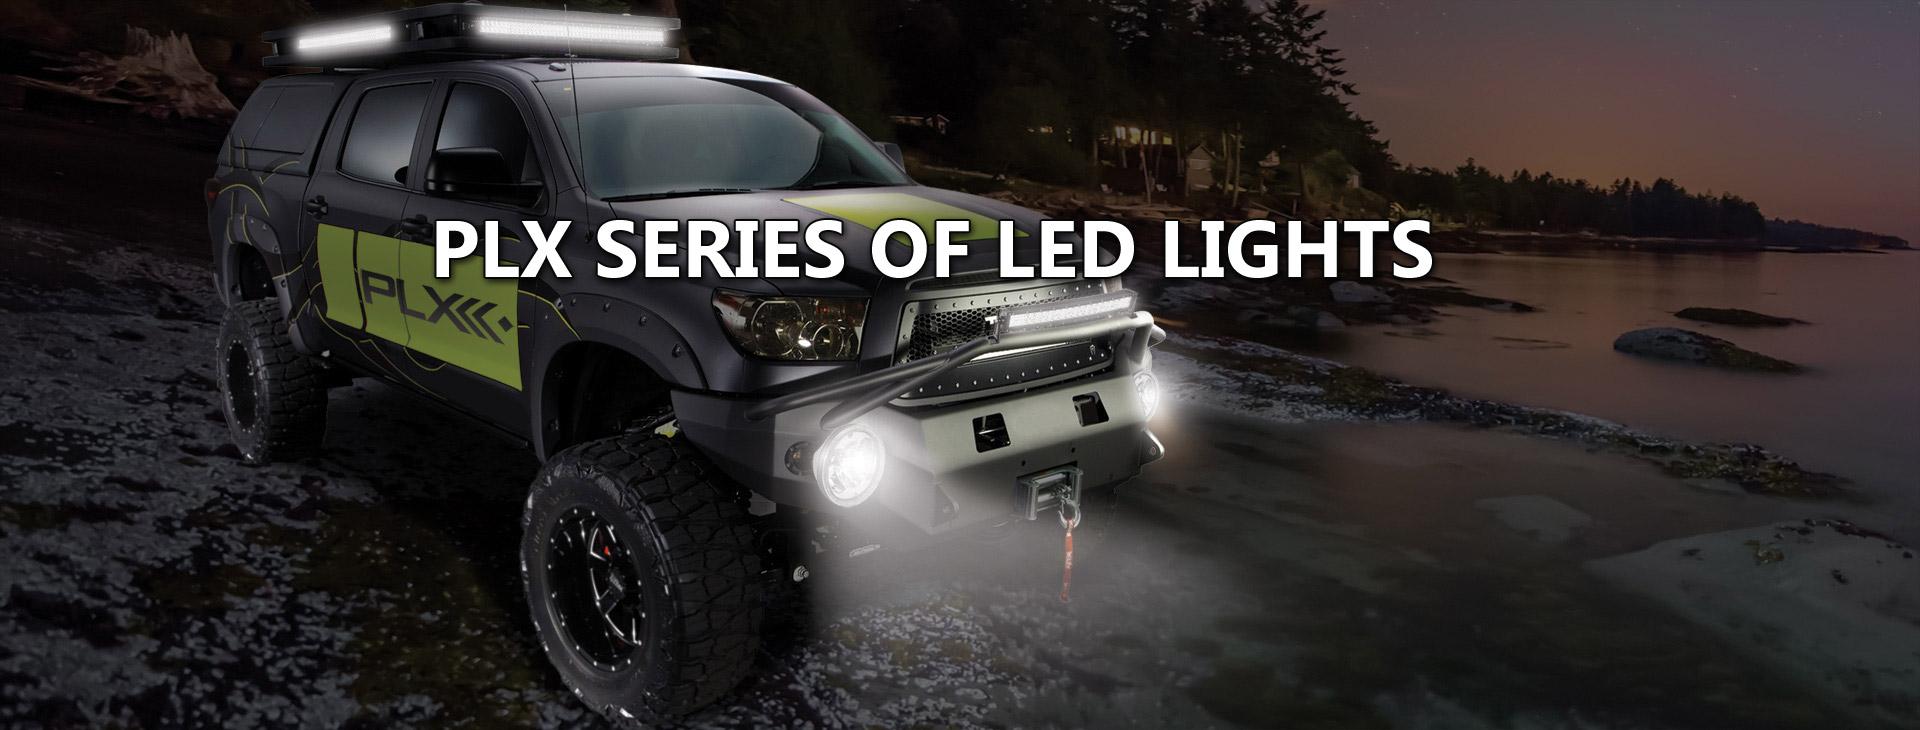 Pilot Automotive Plx Series Of Led Lights 3x3 Fog Light Installledrockerswitchdiagramjpg